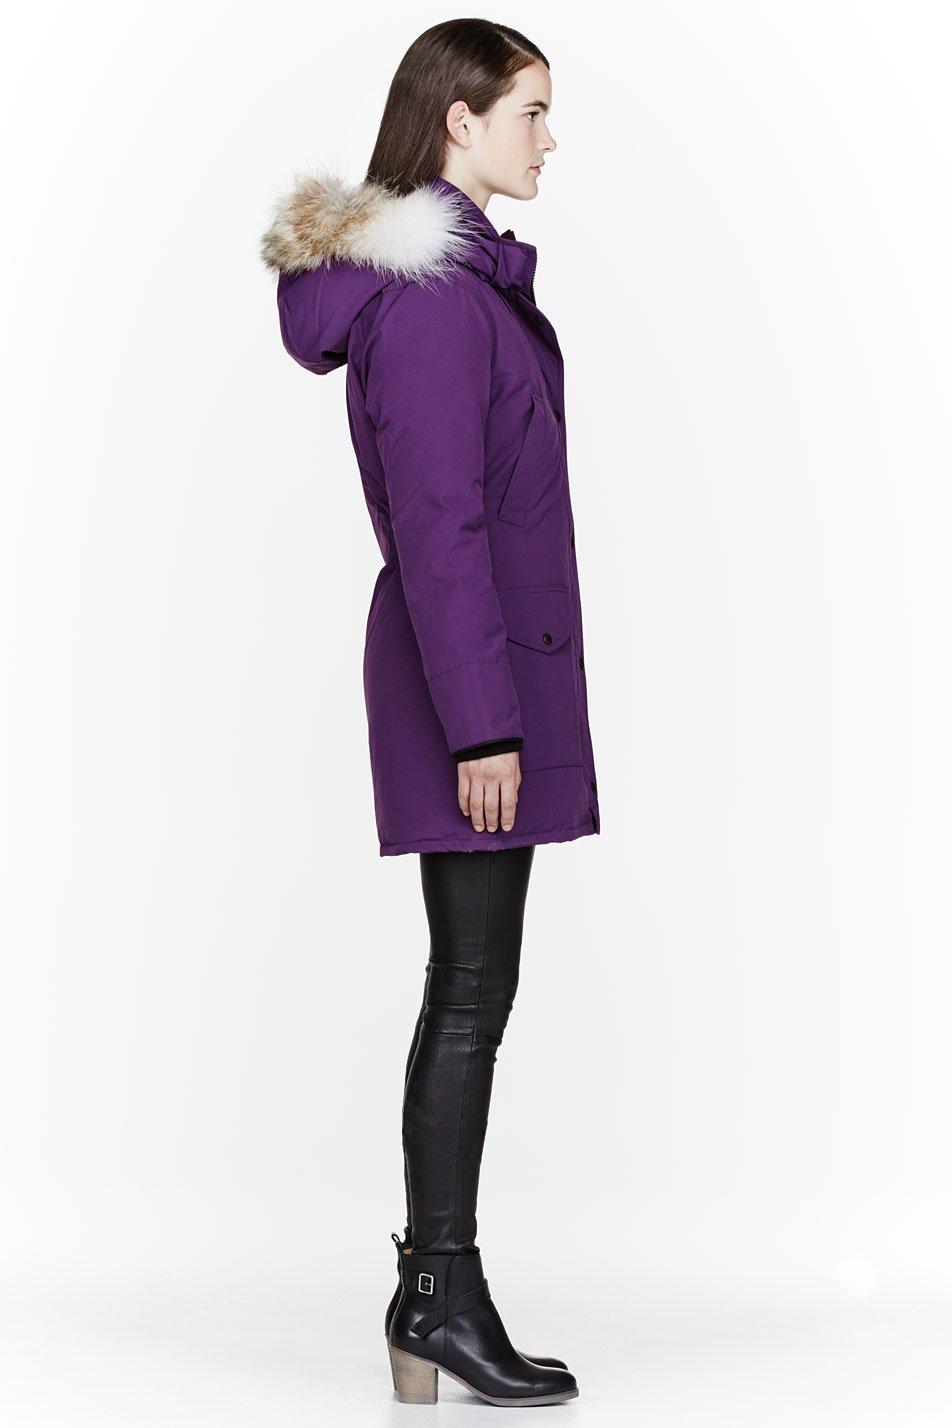 Canada Goose kensington parka replica discounts - Canada goose Purple Down and Fur Trillium Parka in Purple | Lyst